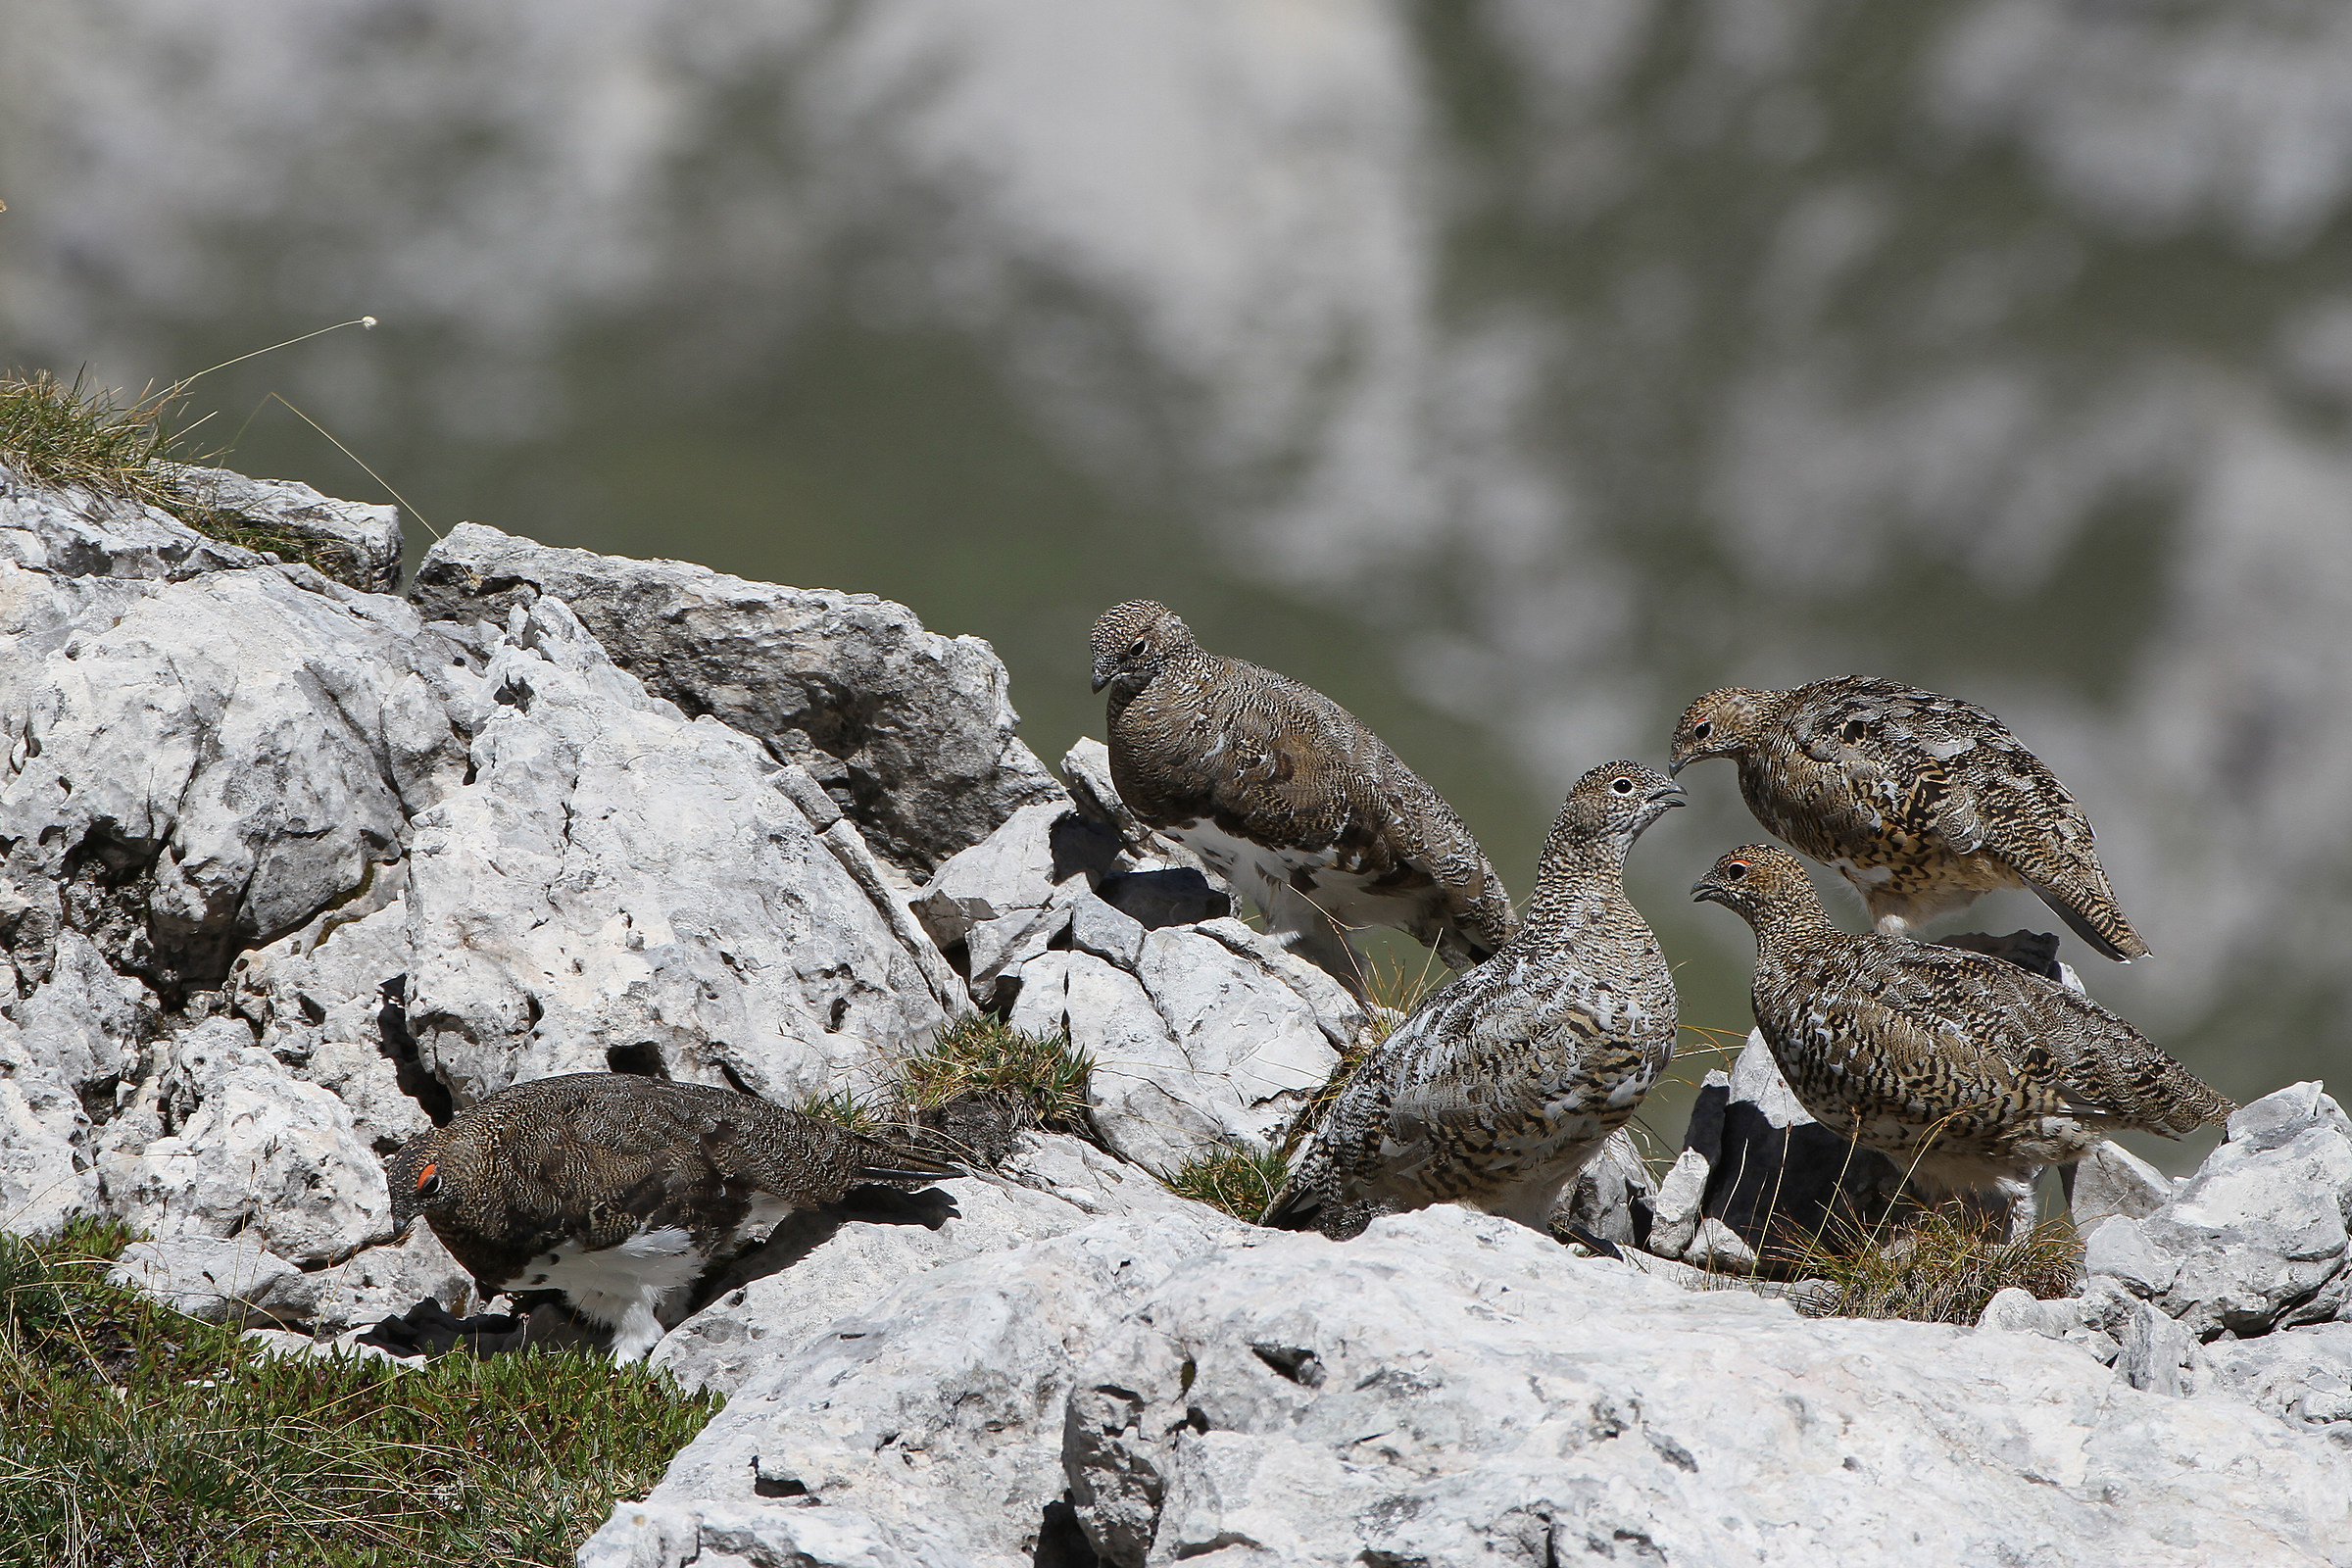 ptarmigan in summer plumage - Dolomites...